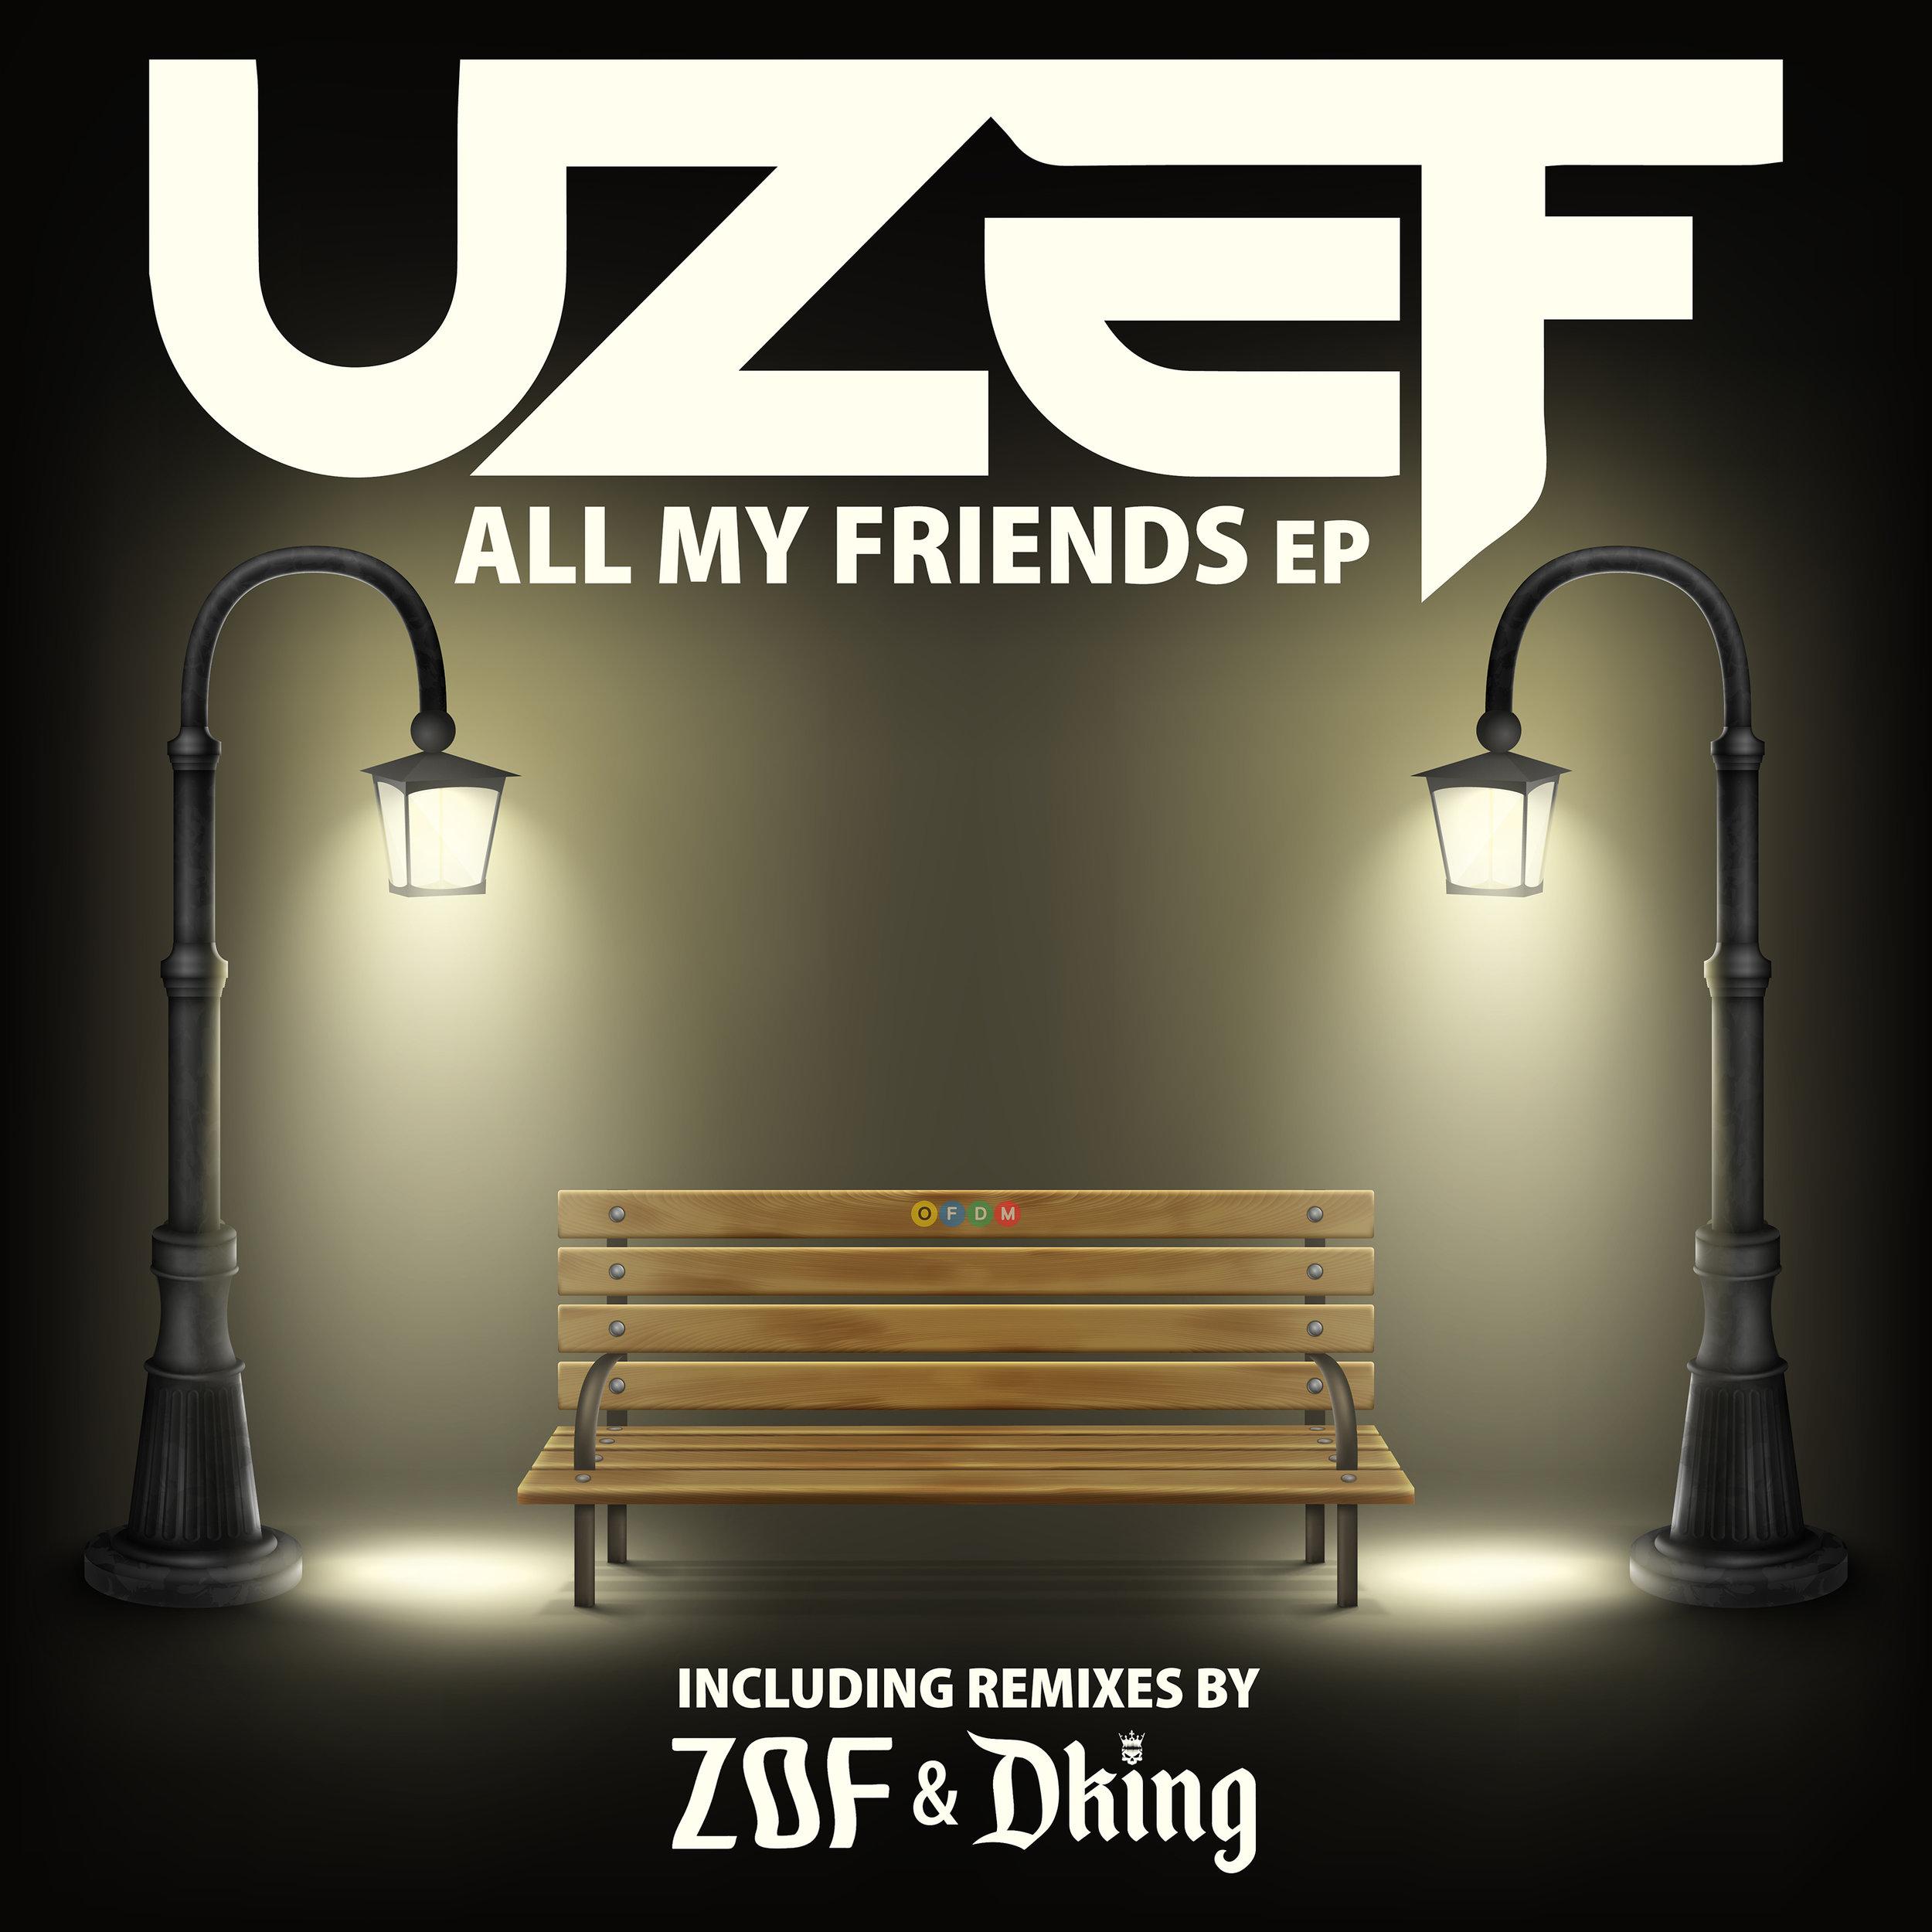 [OFDM033] UZEF - All My Friends EP (ARTWORK).jpg